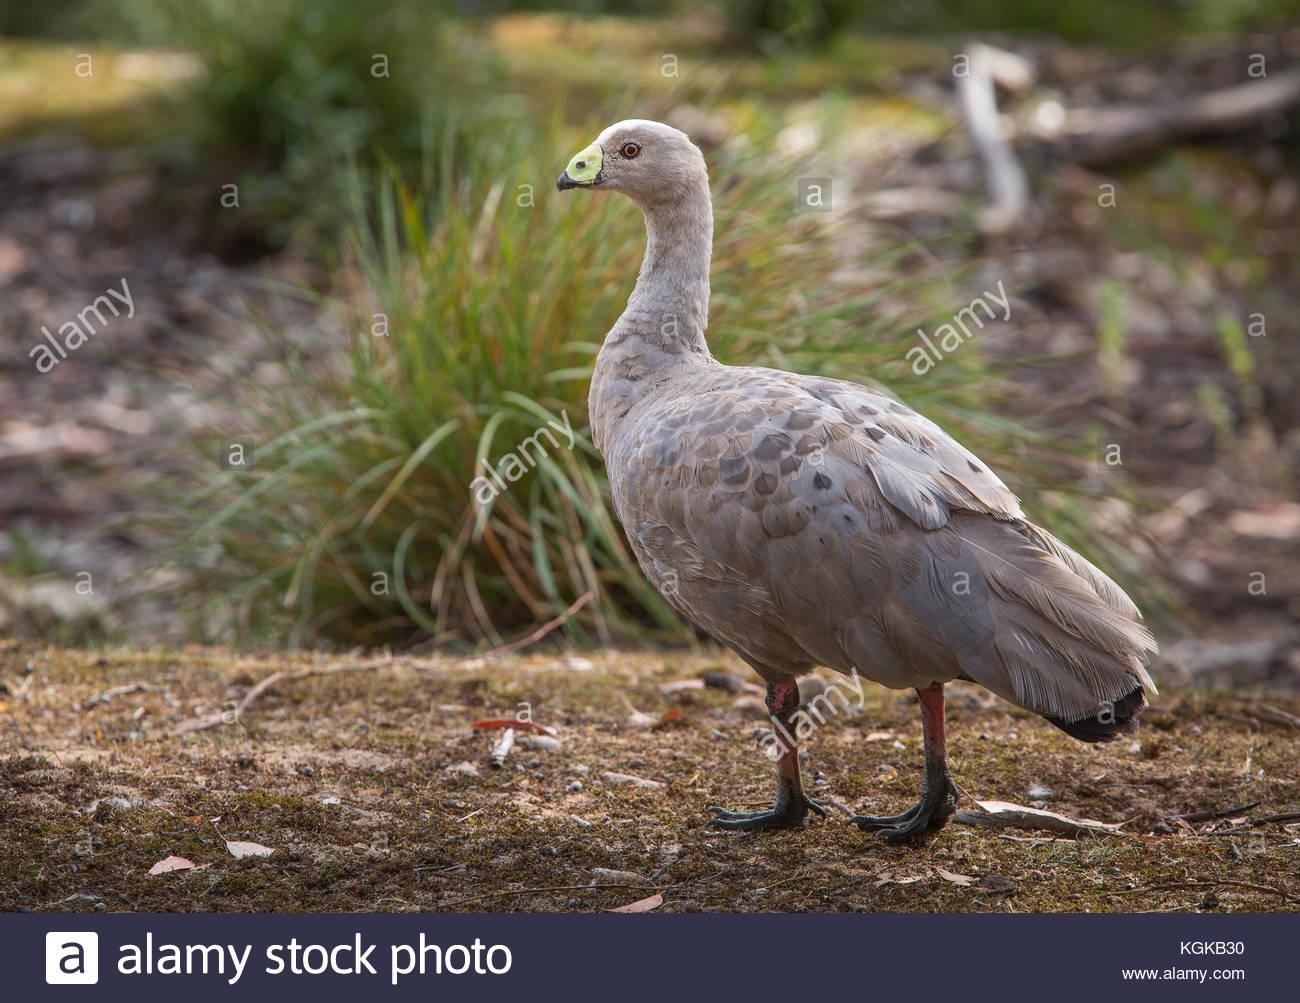 Porträt einer Cape Barren Goose, Cereopsis novaehollandiae. Stockbild